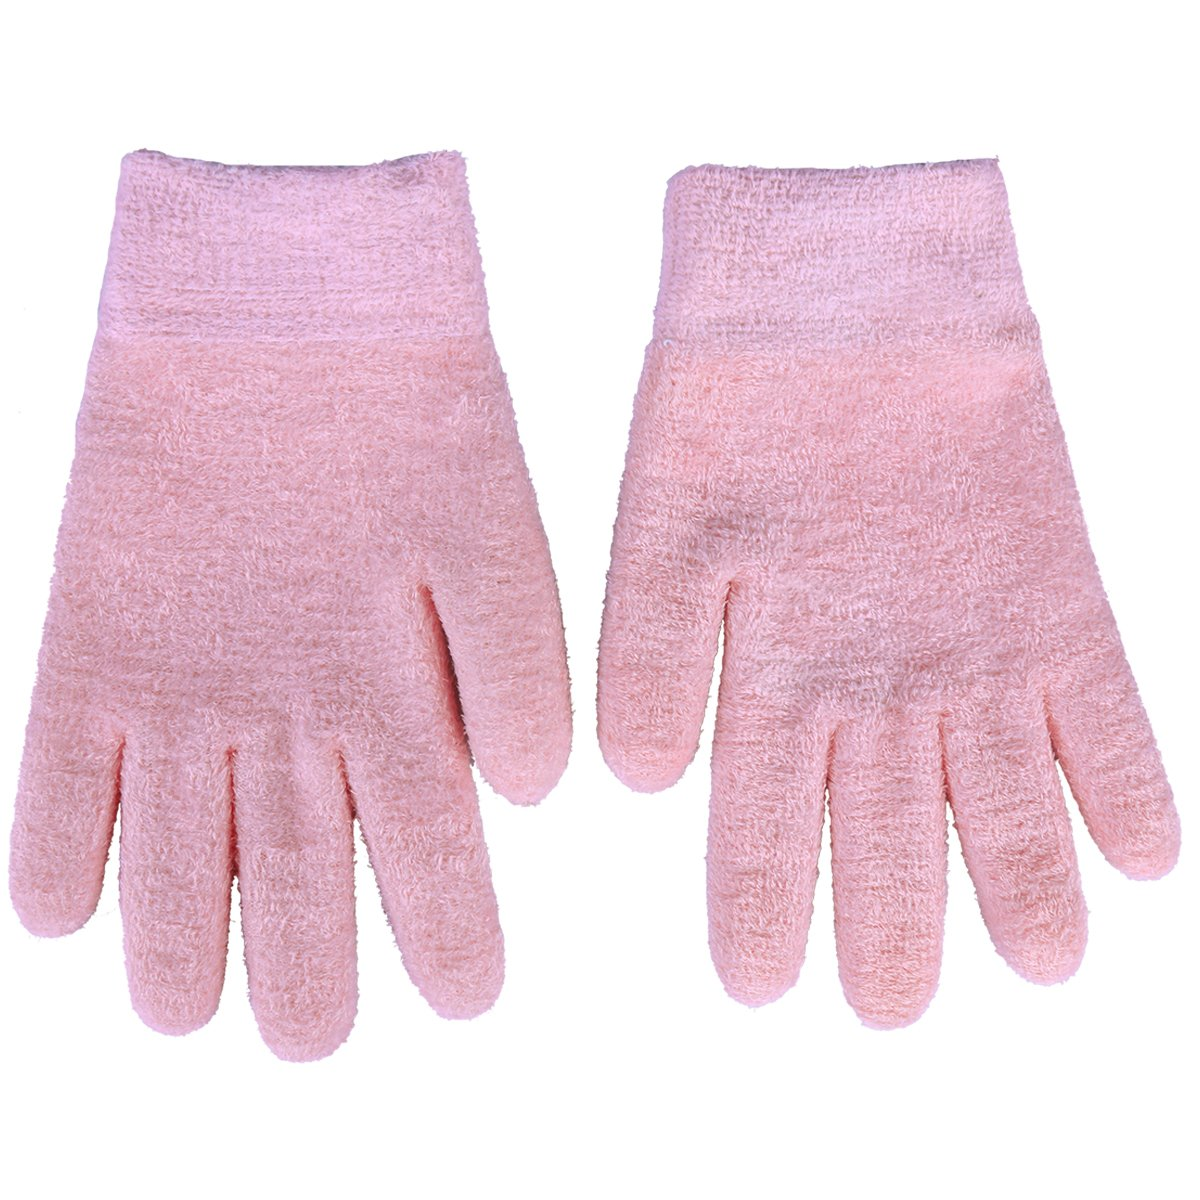 xhorizon FL1 2 Pairs Gel Moisturizing Spa Gloves Soft Cotton with Thermoplastic Gel Repair Heal Eczema Cracked Dry Skin